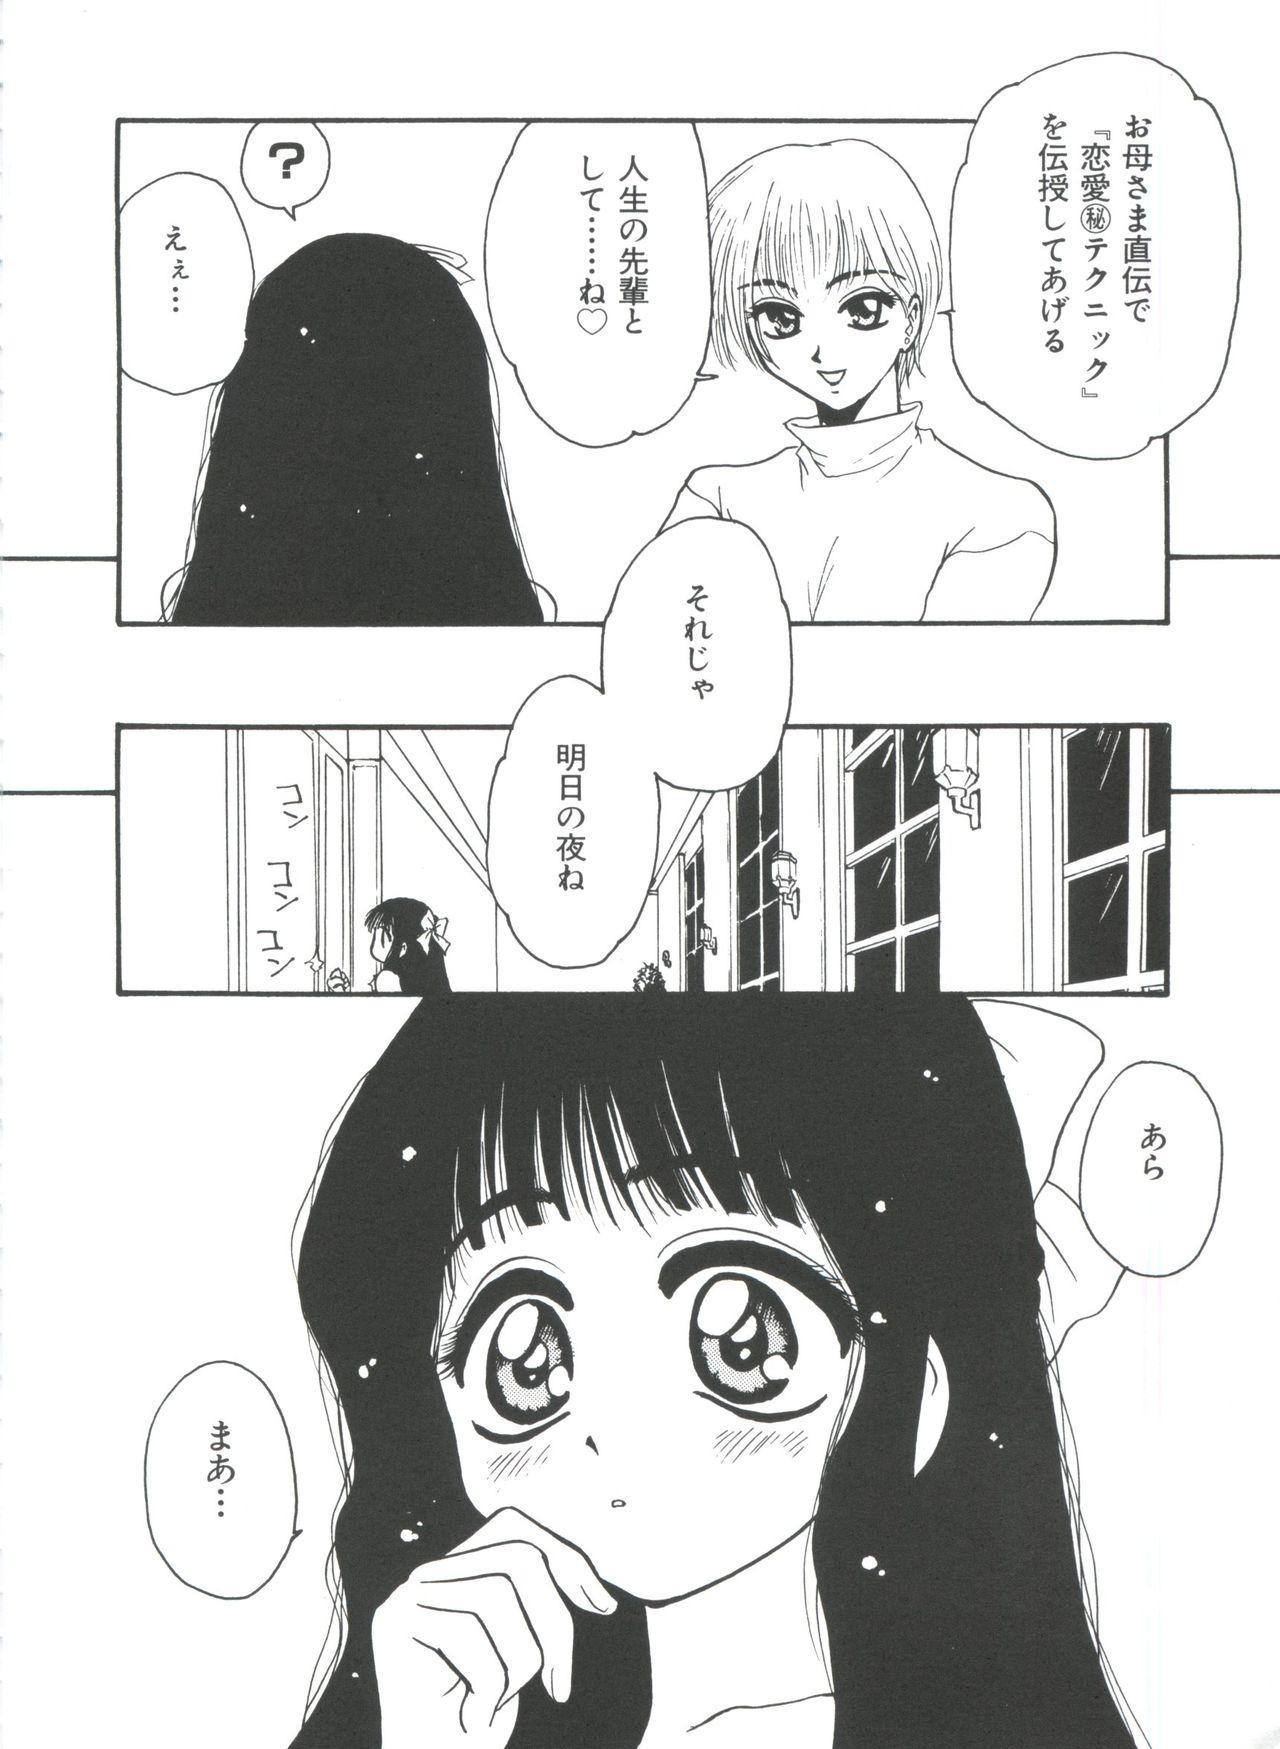 Ero-chan to Issho 3 27